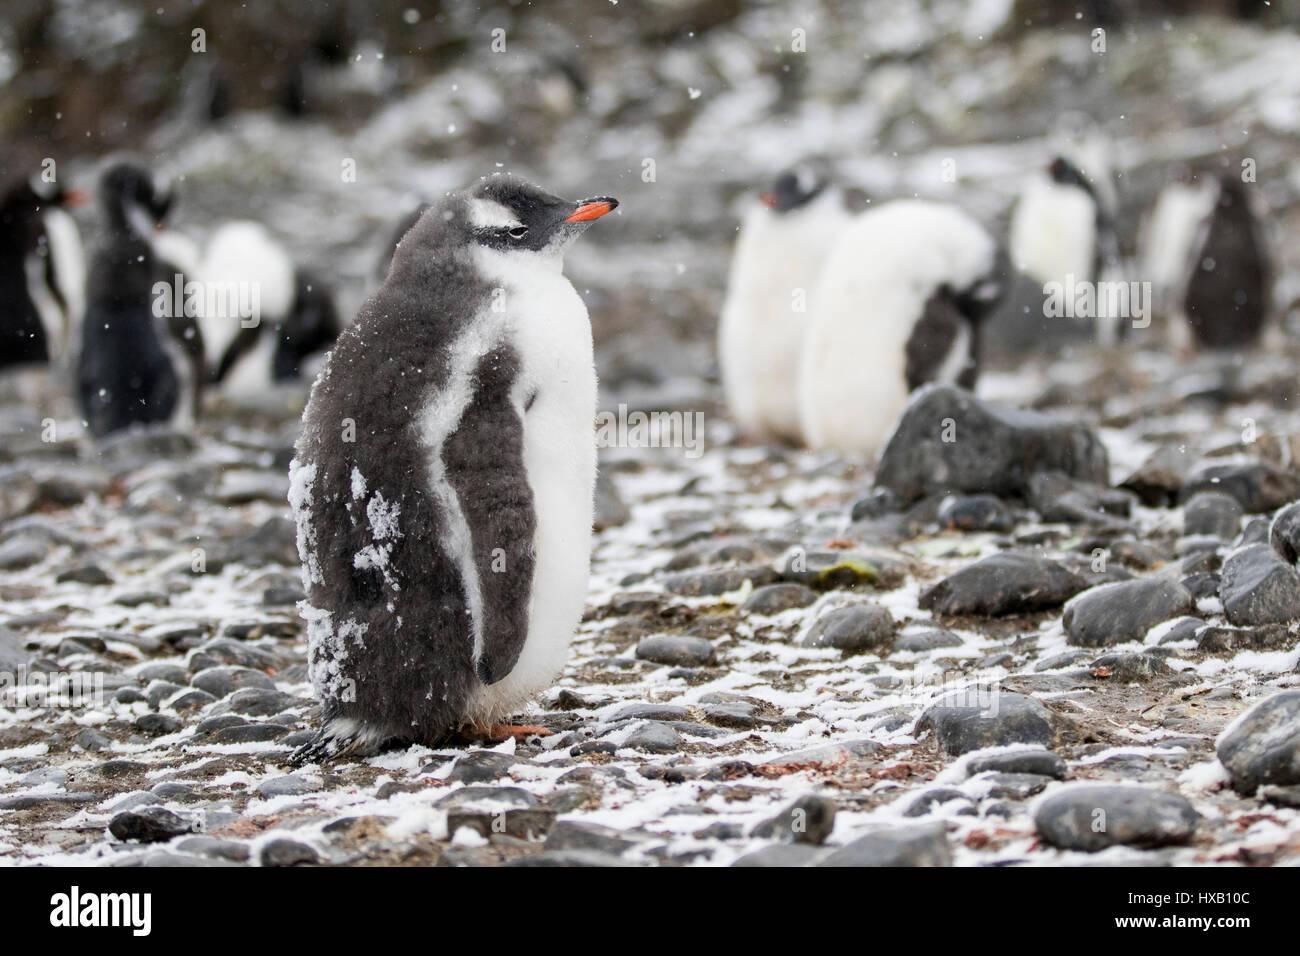 Penguin chick, chicks. Gentoo penguins Antarctica. Stock Photo